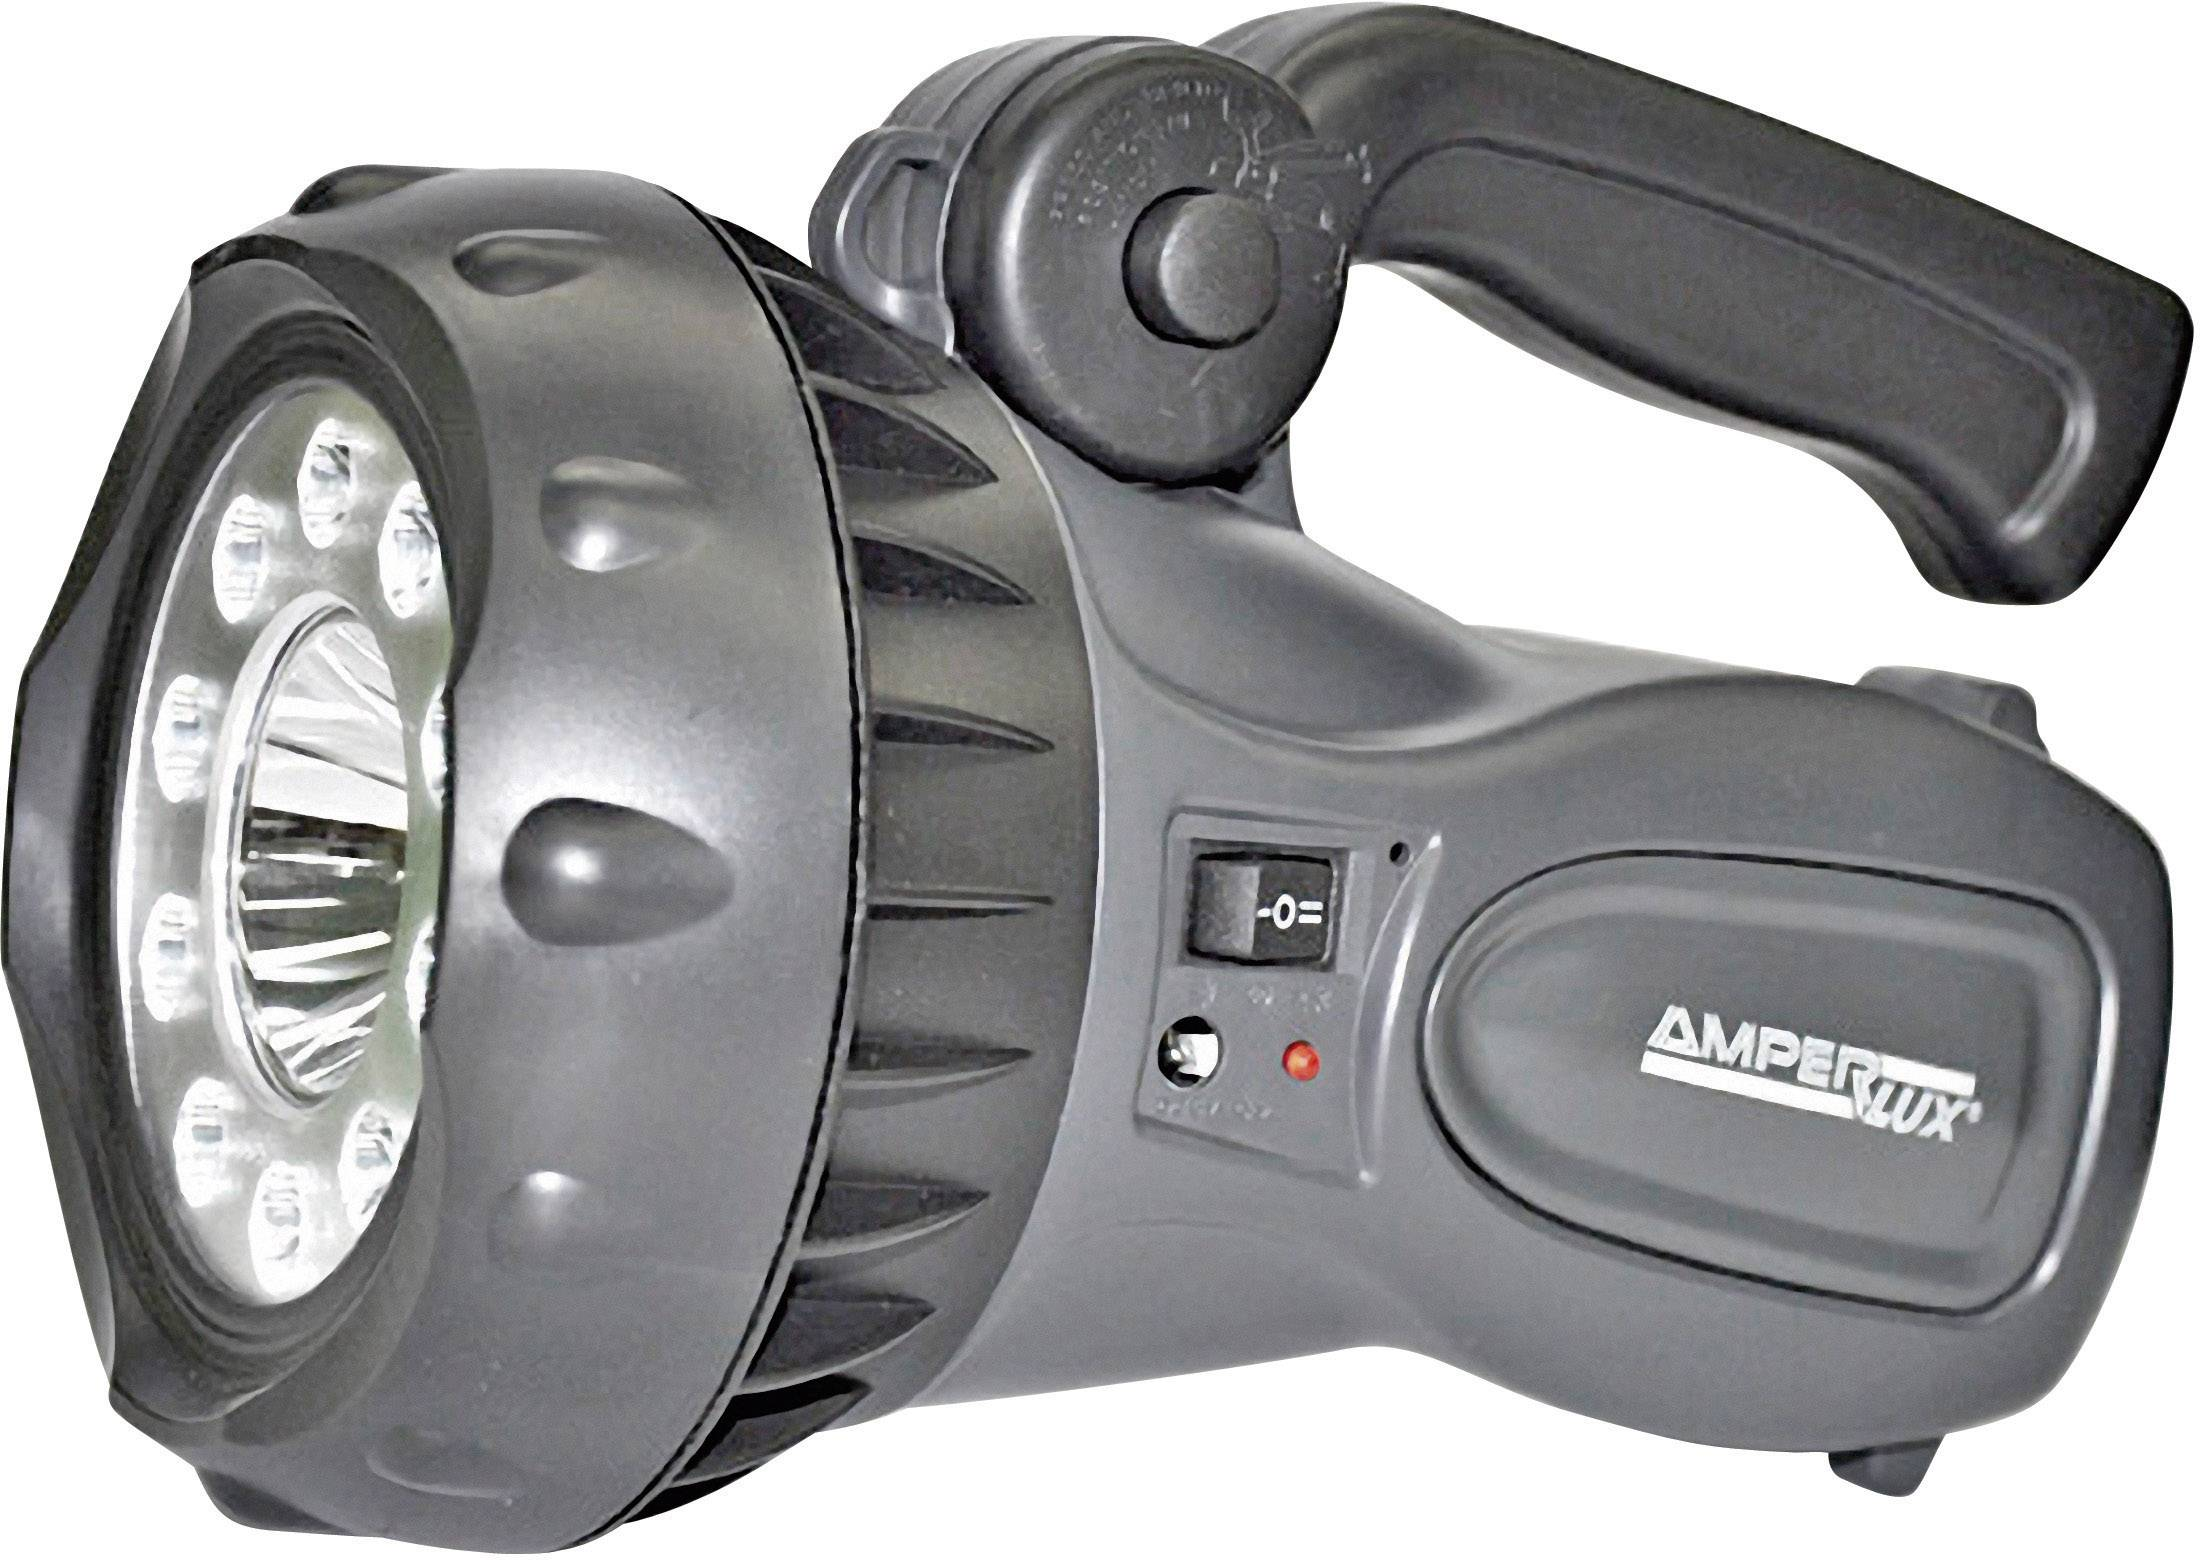 Akumulátorový ručný LED reflektor Ampercell AM 3031 LED, 3 W